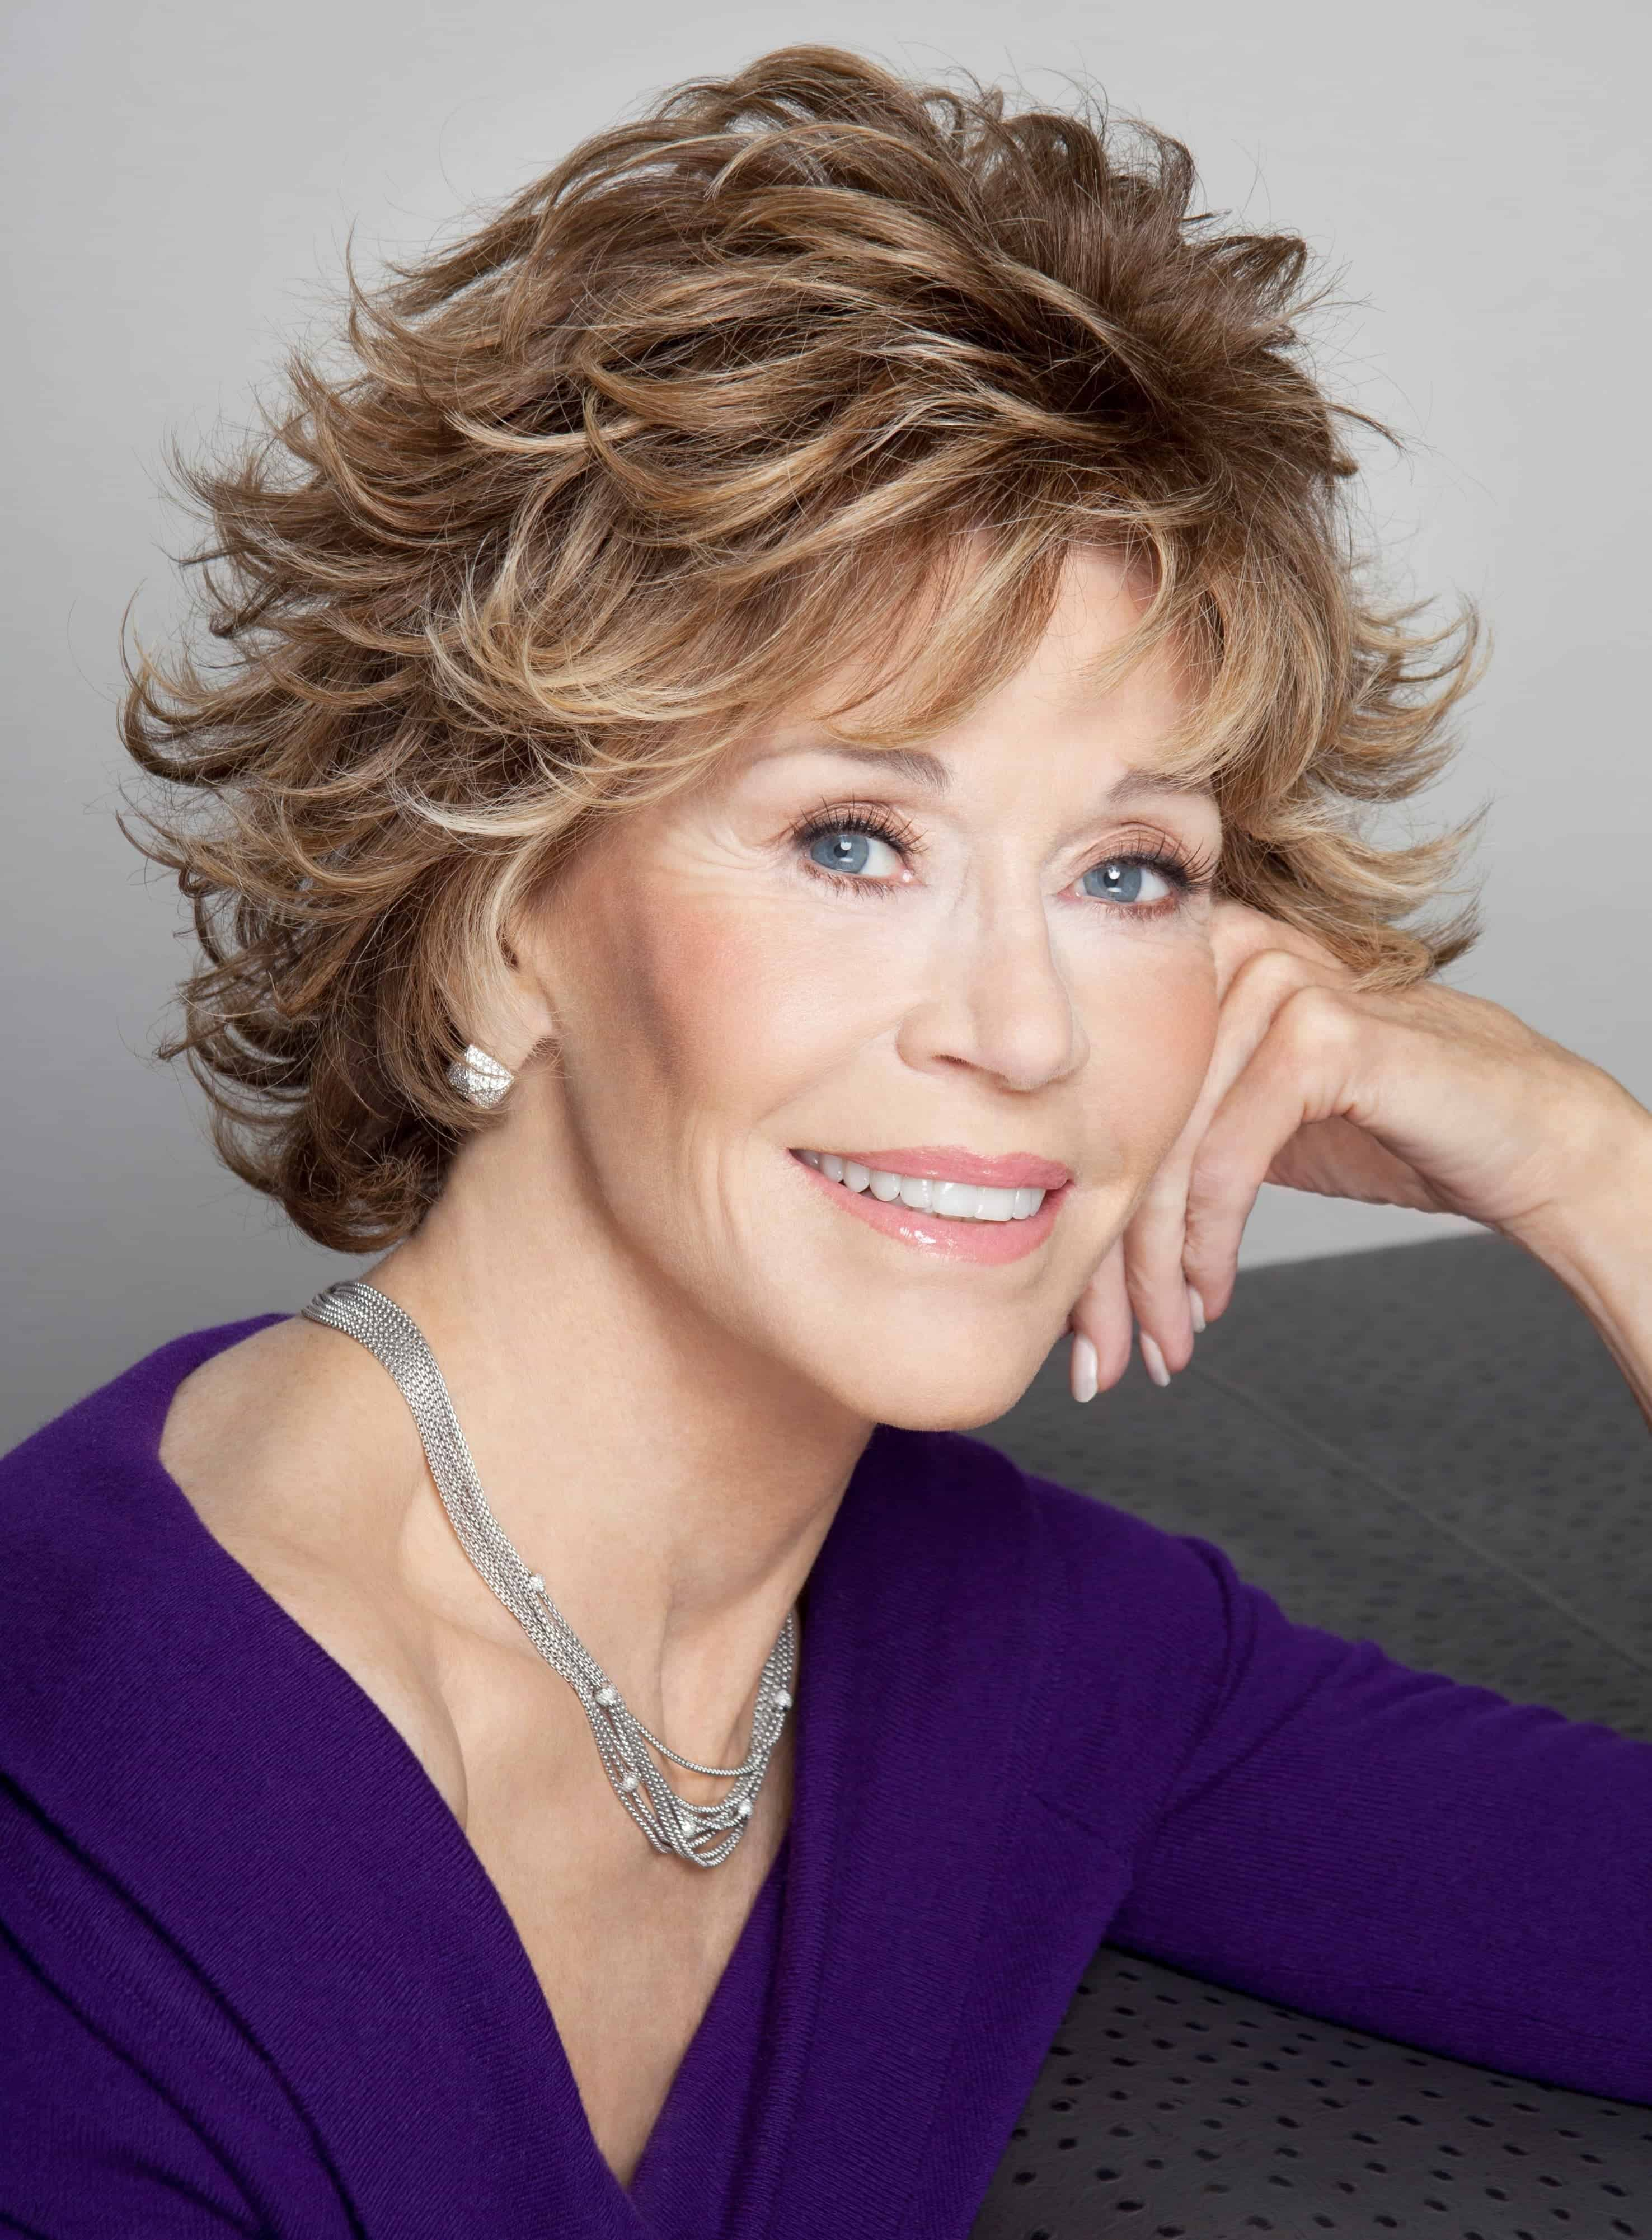 Jane Fonda Haircut Wavy Layered Synthetic Hair Capless Wigs 8 Inches